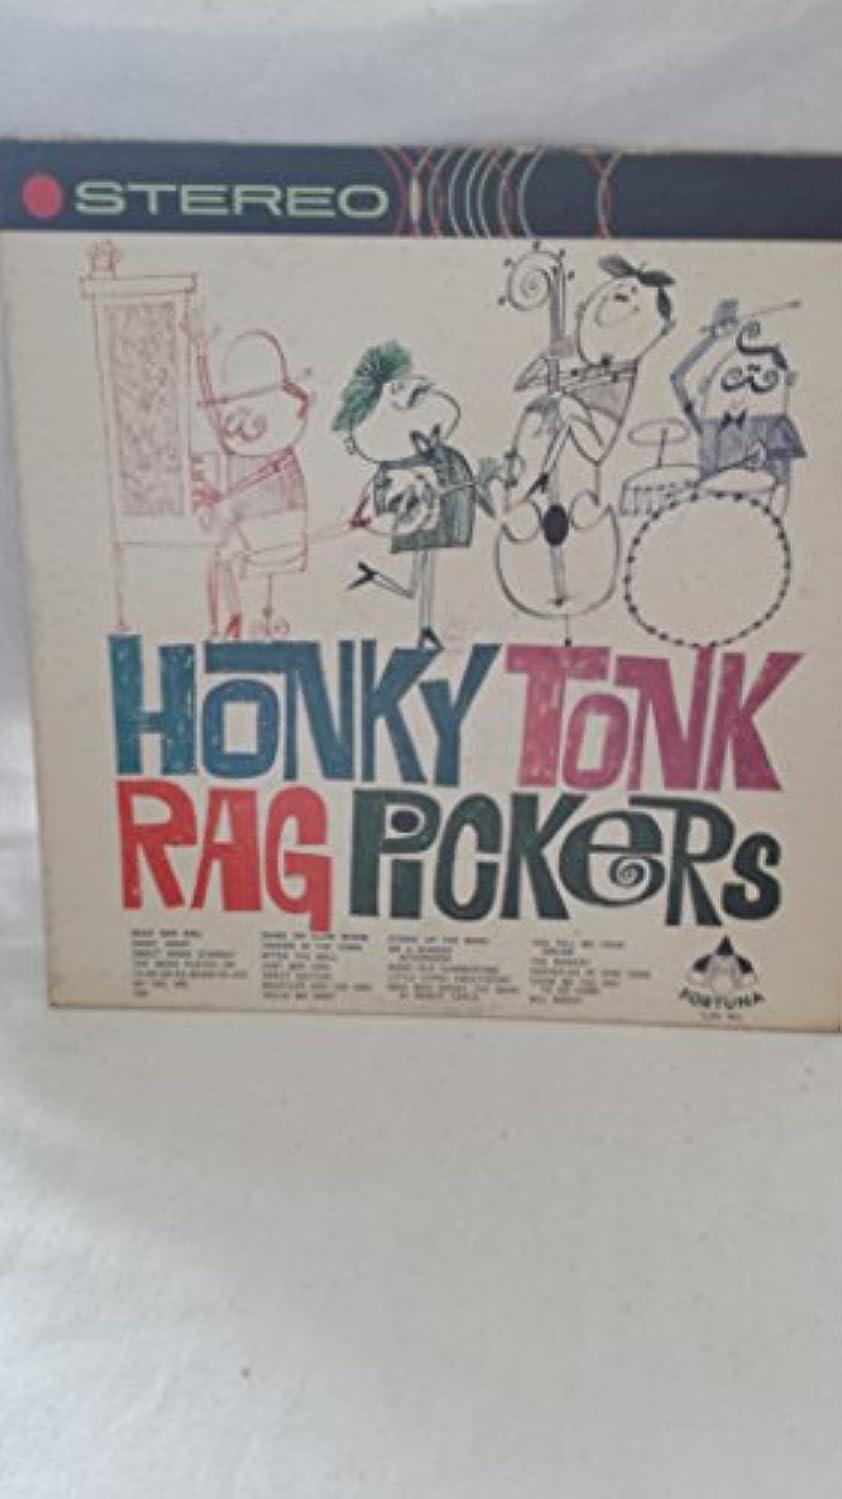 Honky Tonk Rag Pickers - Fortuna TLPS901 - Stereo